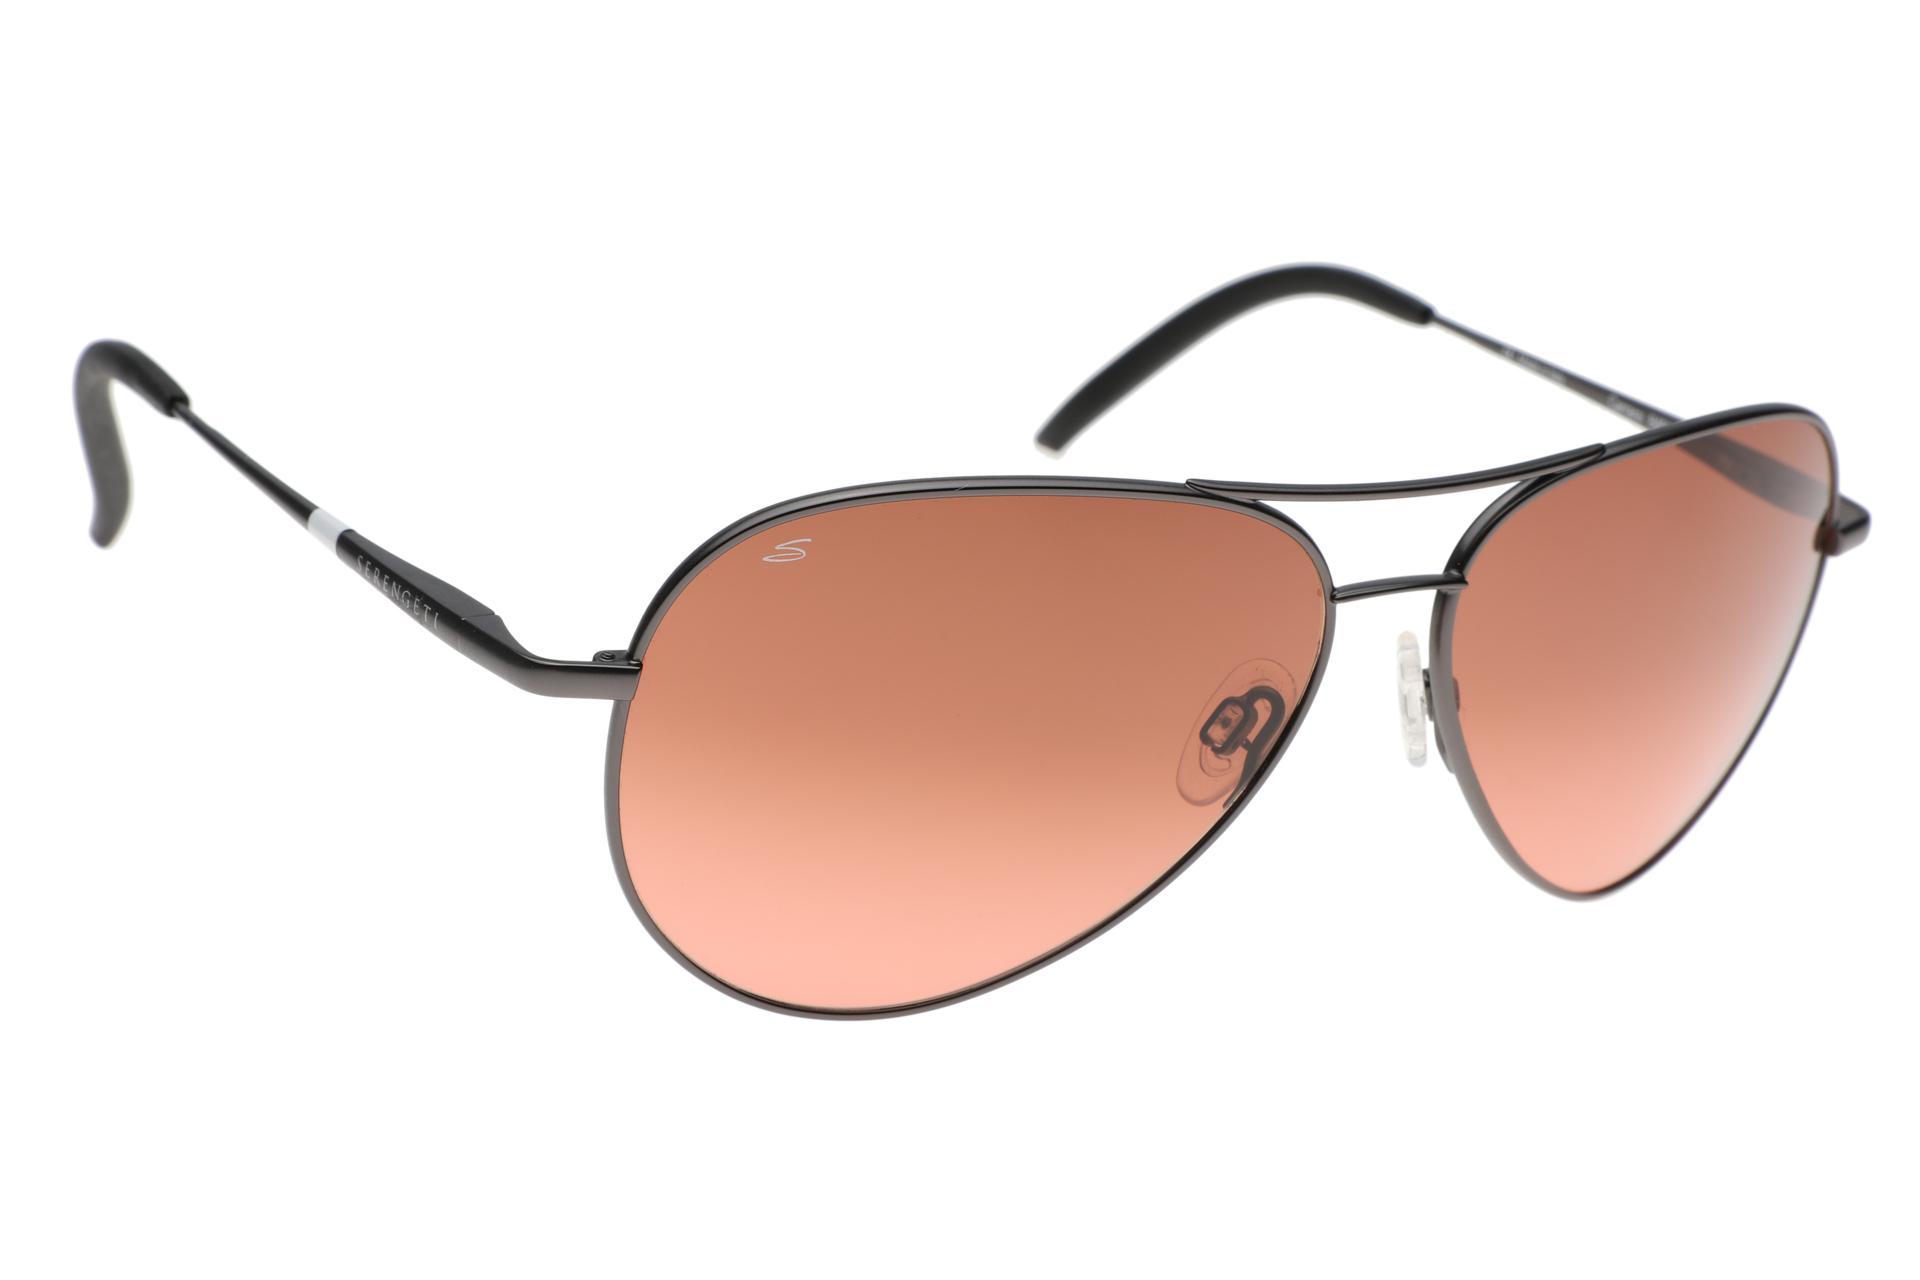 bc2737356f6 Serengeti Carrara Pilot 8453 (Satin Dark Gunmetal) Gradient zonnebril